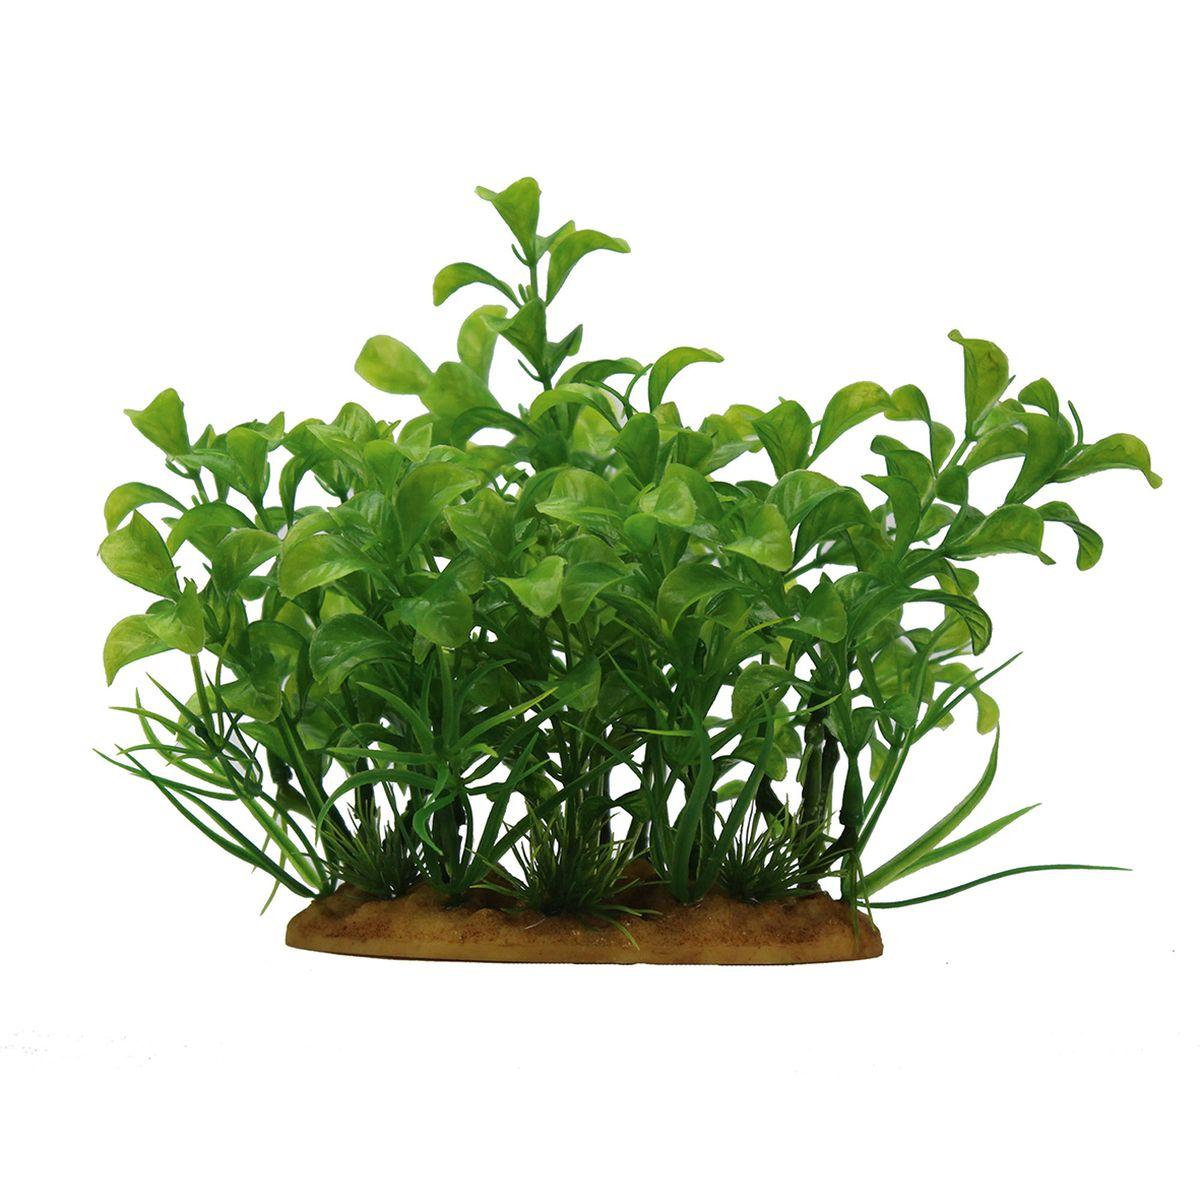 Растение для аквариума ArtUniq Людвигия зеленая, высота 15 смART-1160105Растение для аквариума ArtUniq Людвигия зеленая, высота 15 см